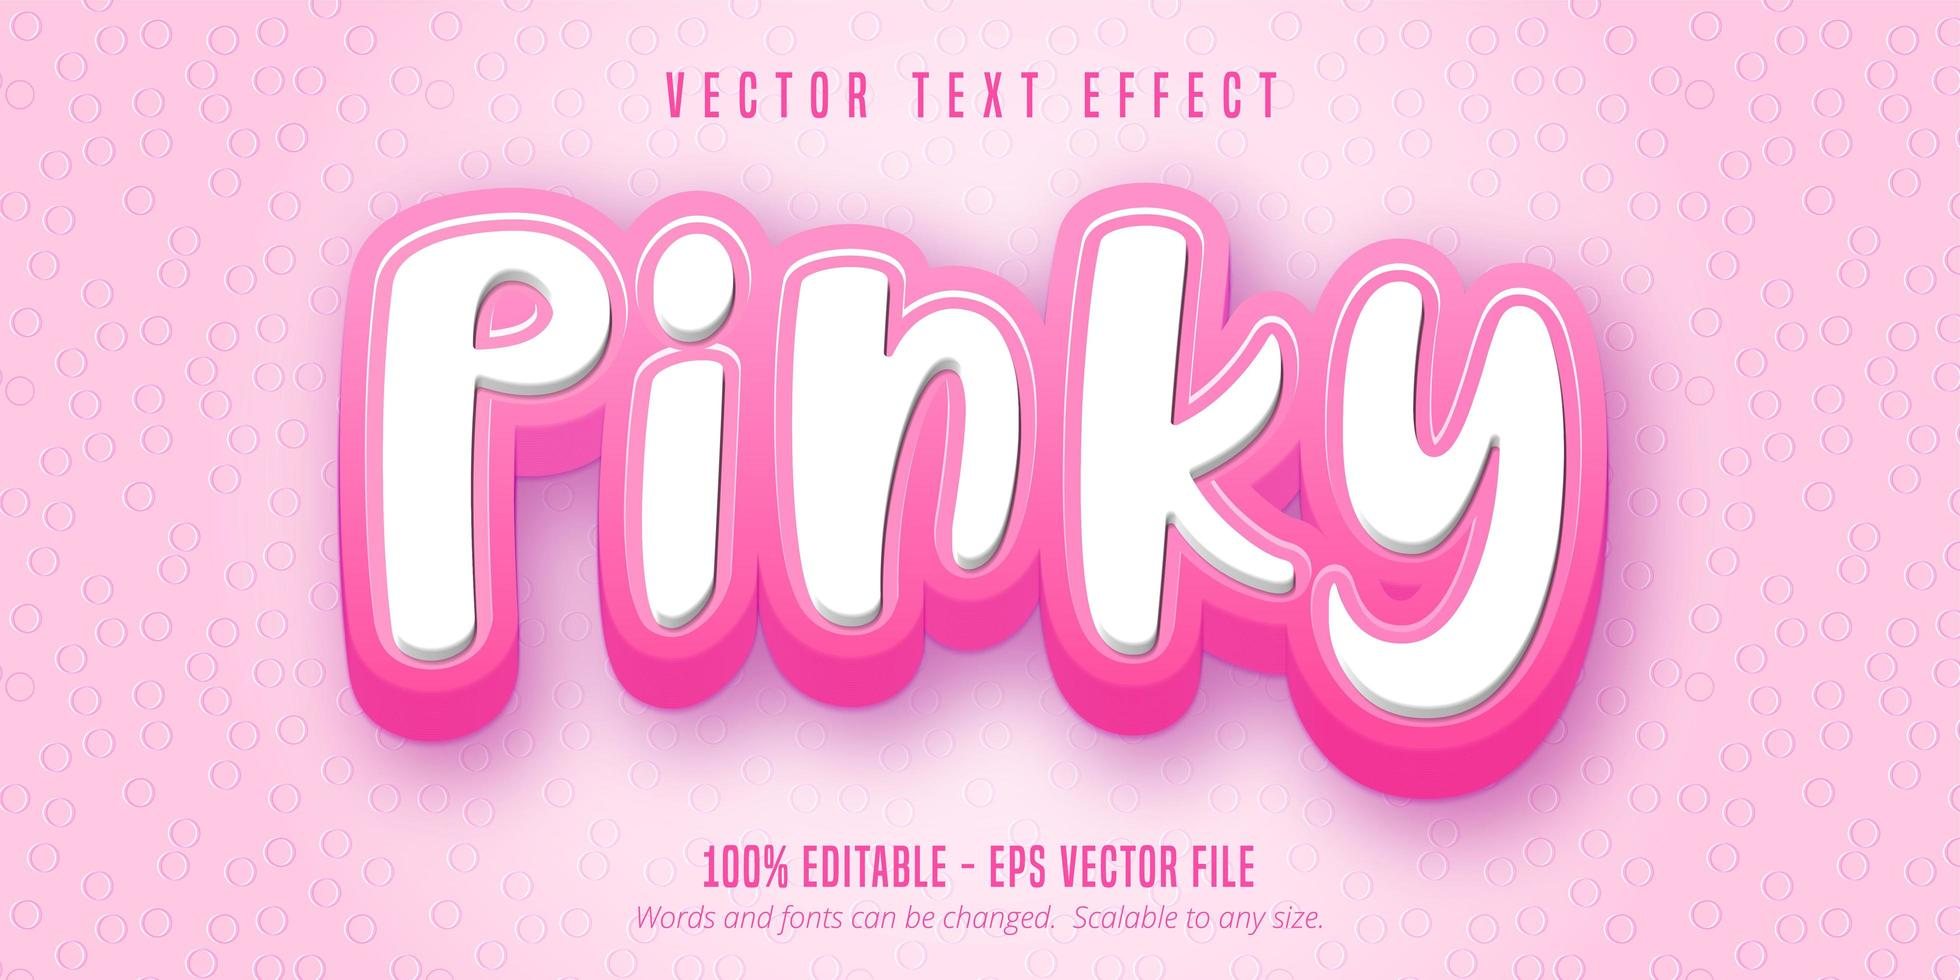 texto rosado, efeito de texto estilo desenho animado vetor